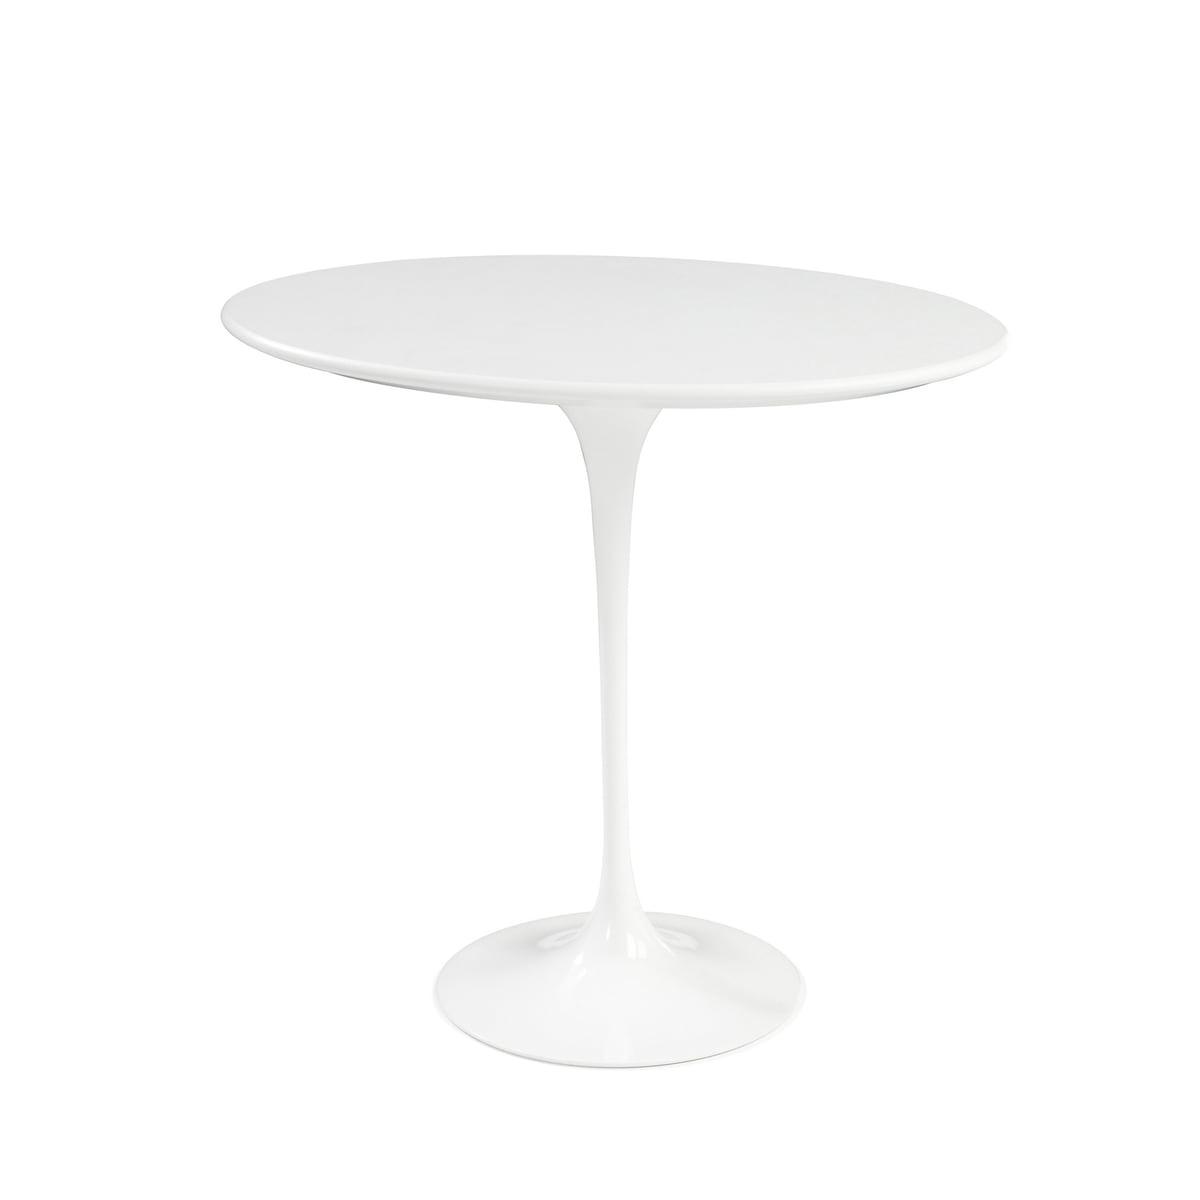 saarinen tulip side table knoll shop. Black Bedroom Furniture Sets. Home Design Ideas